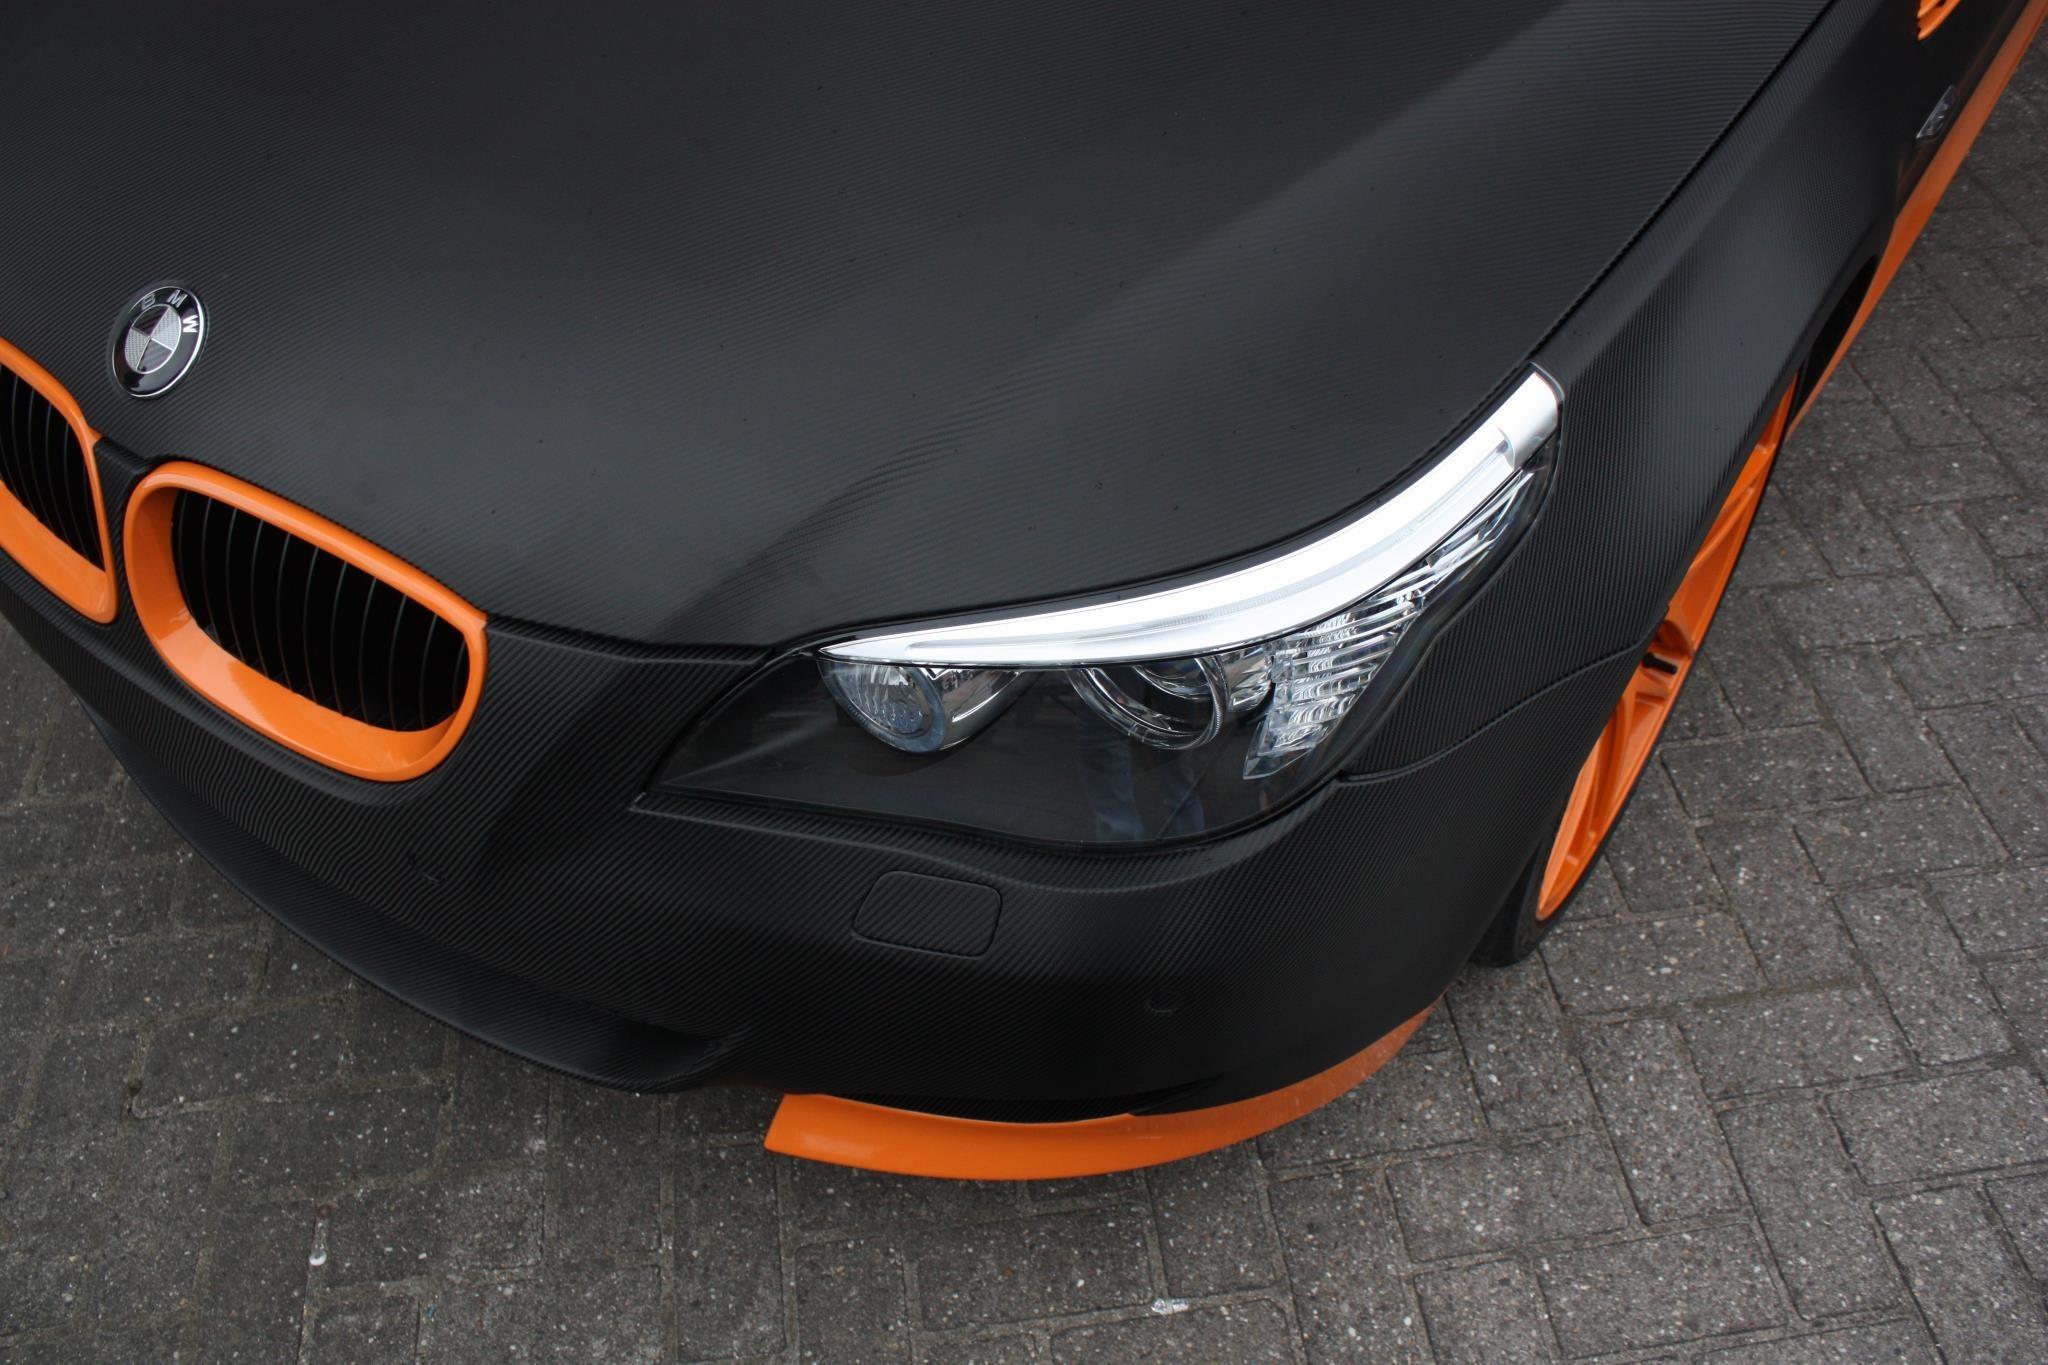 Wallpaper Bmw Car Black Colour